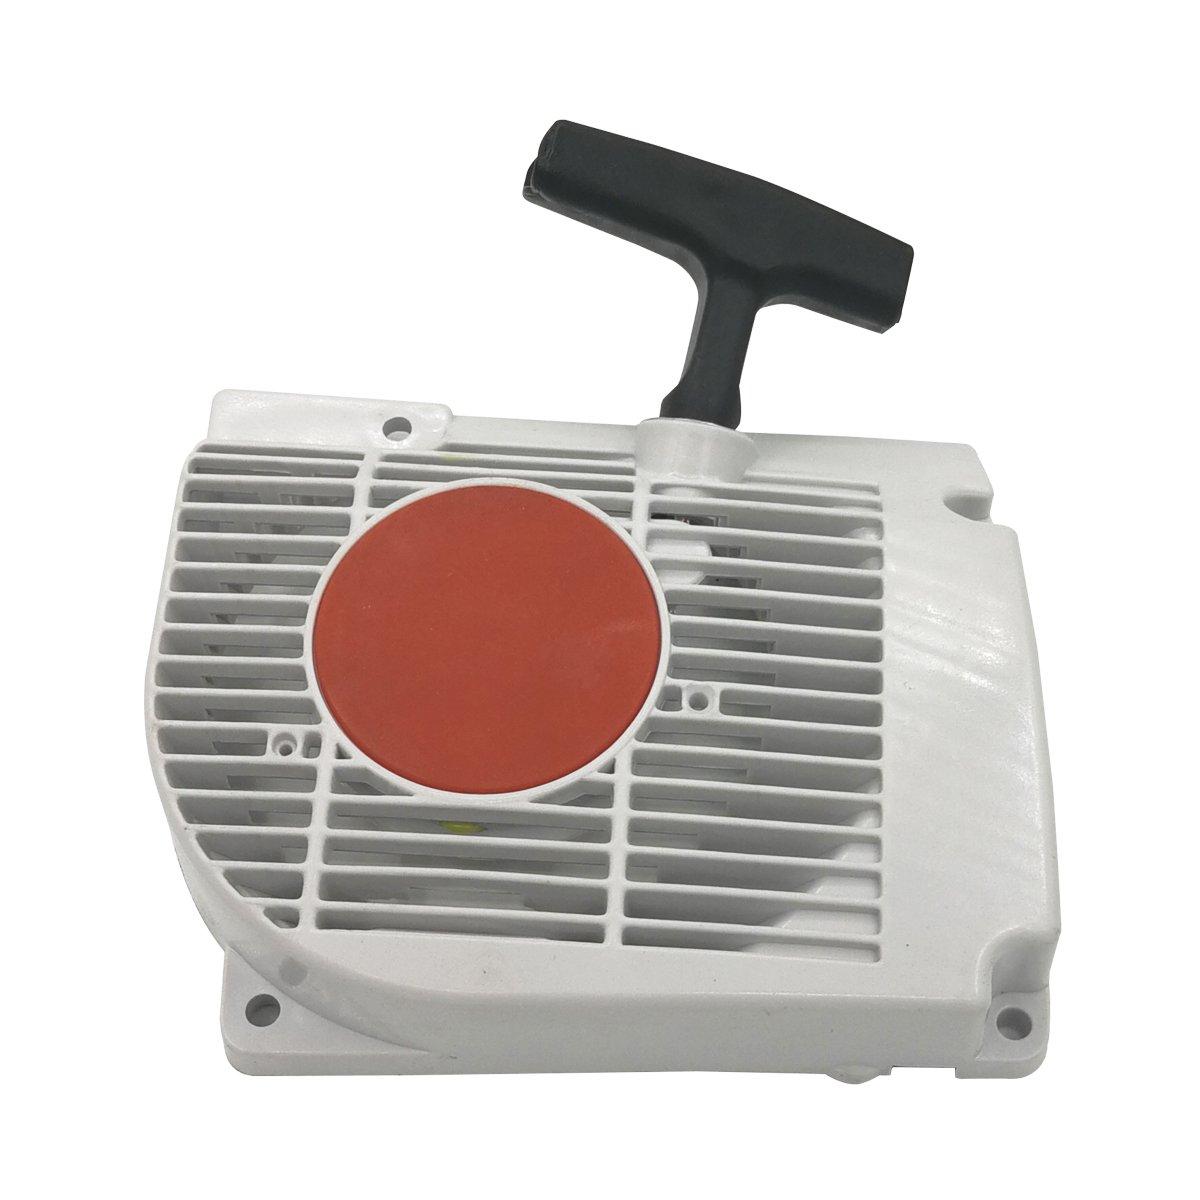 Cancanle Recoil R/ücklauf Pull Starter f/ür Motors/äge STIHL 029/039/MS290/MS390/MS310